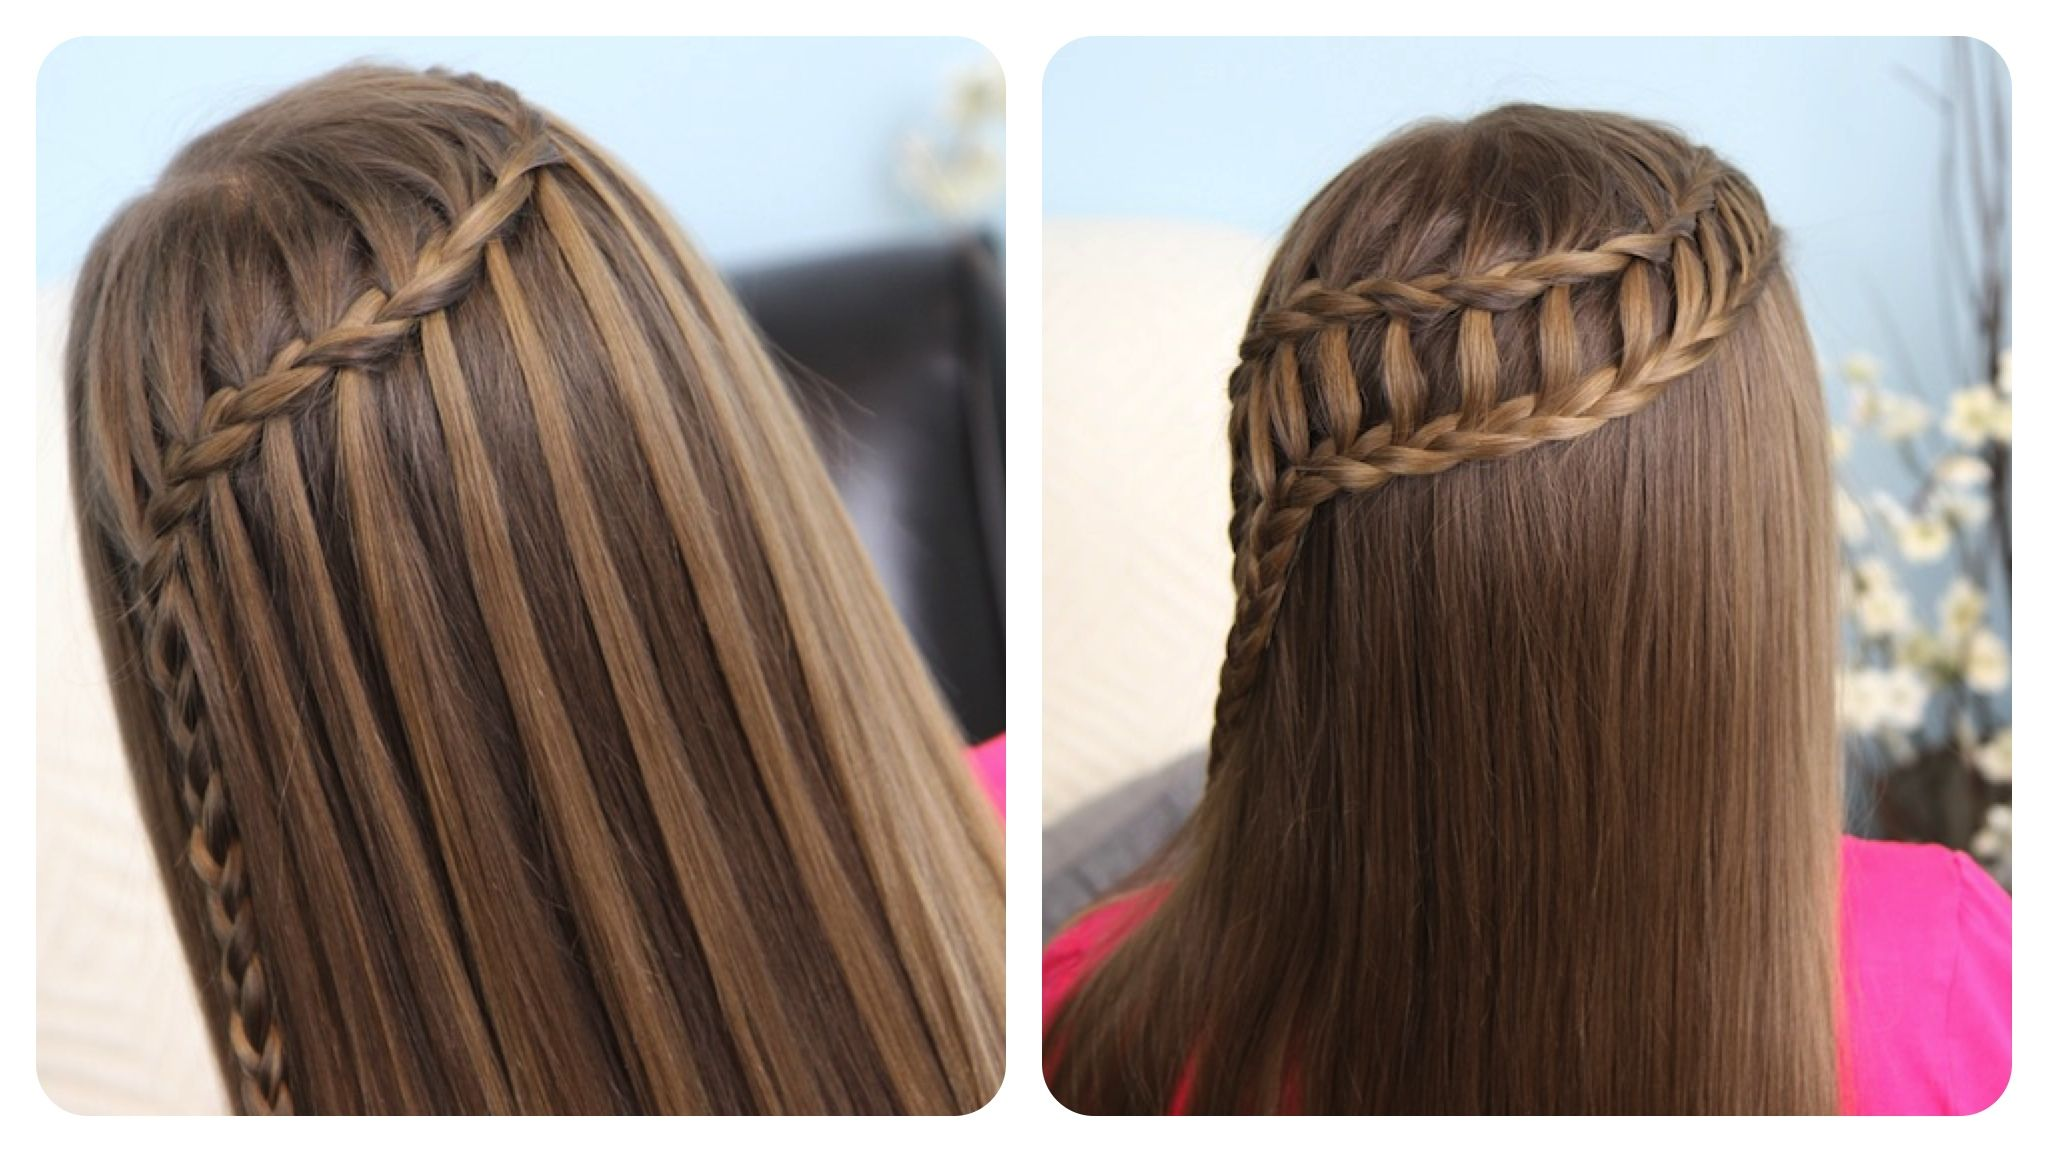 Hairstyles Cute girl hairstyles waterfall braid & ladder braid